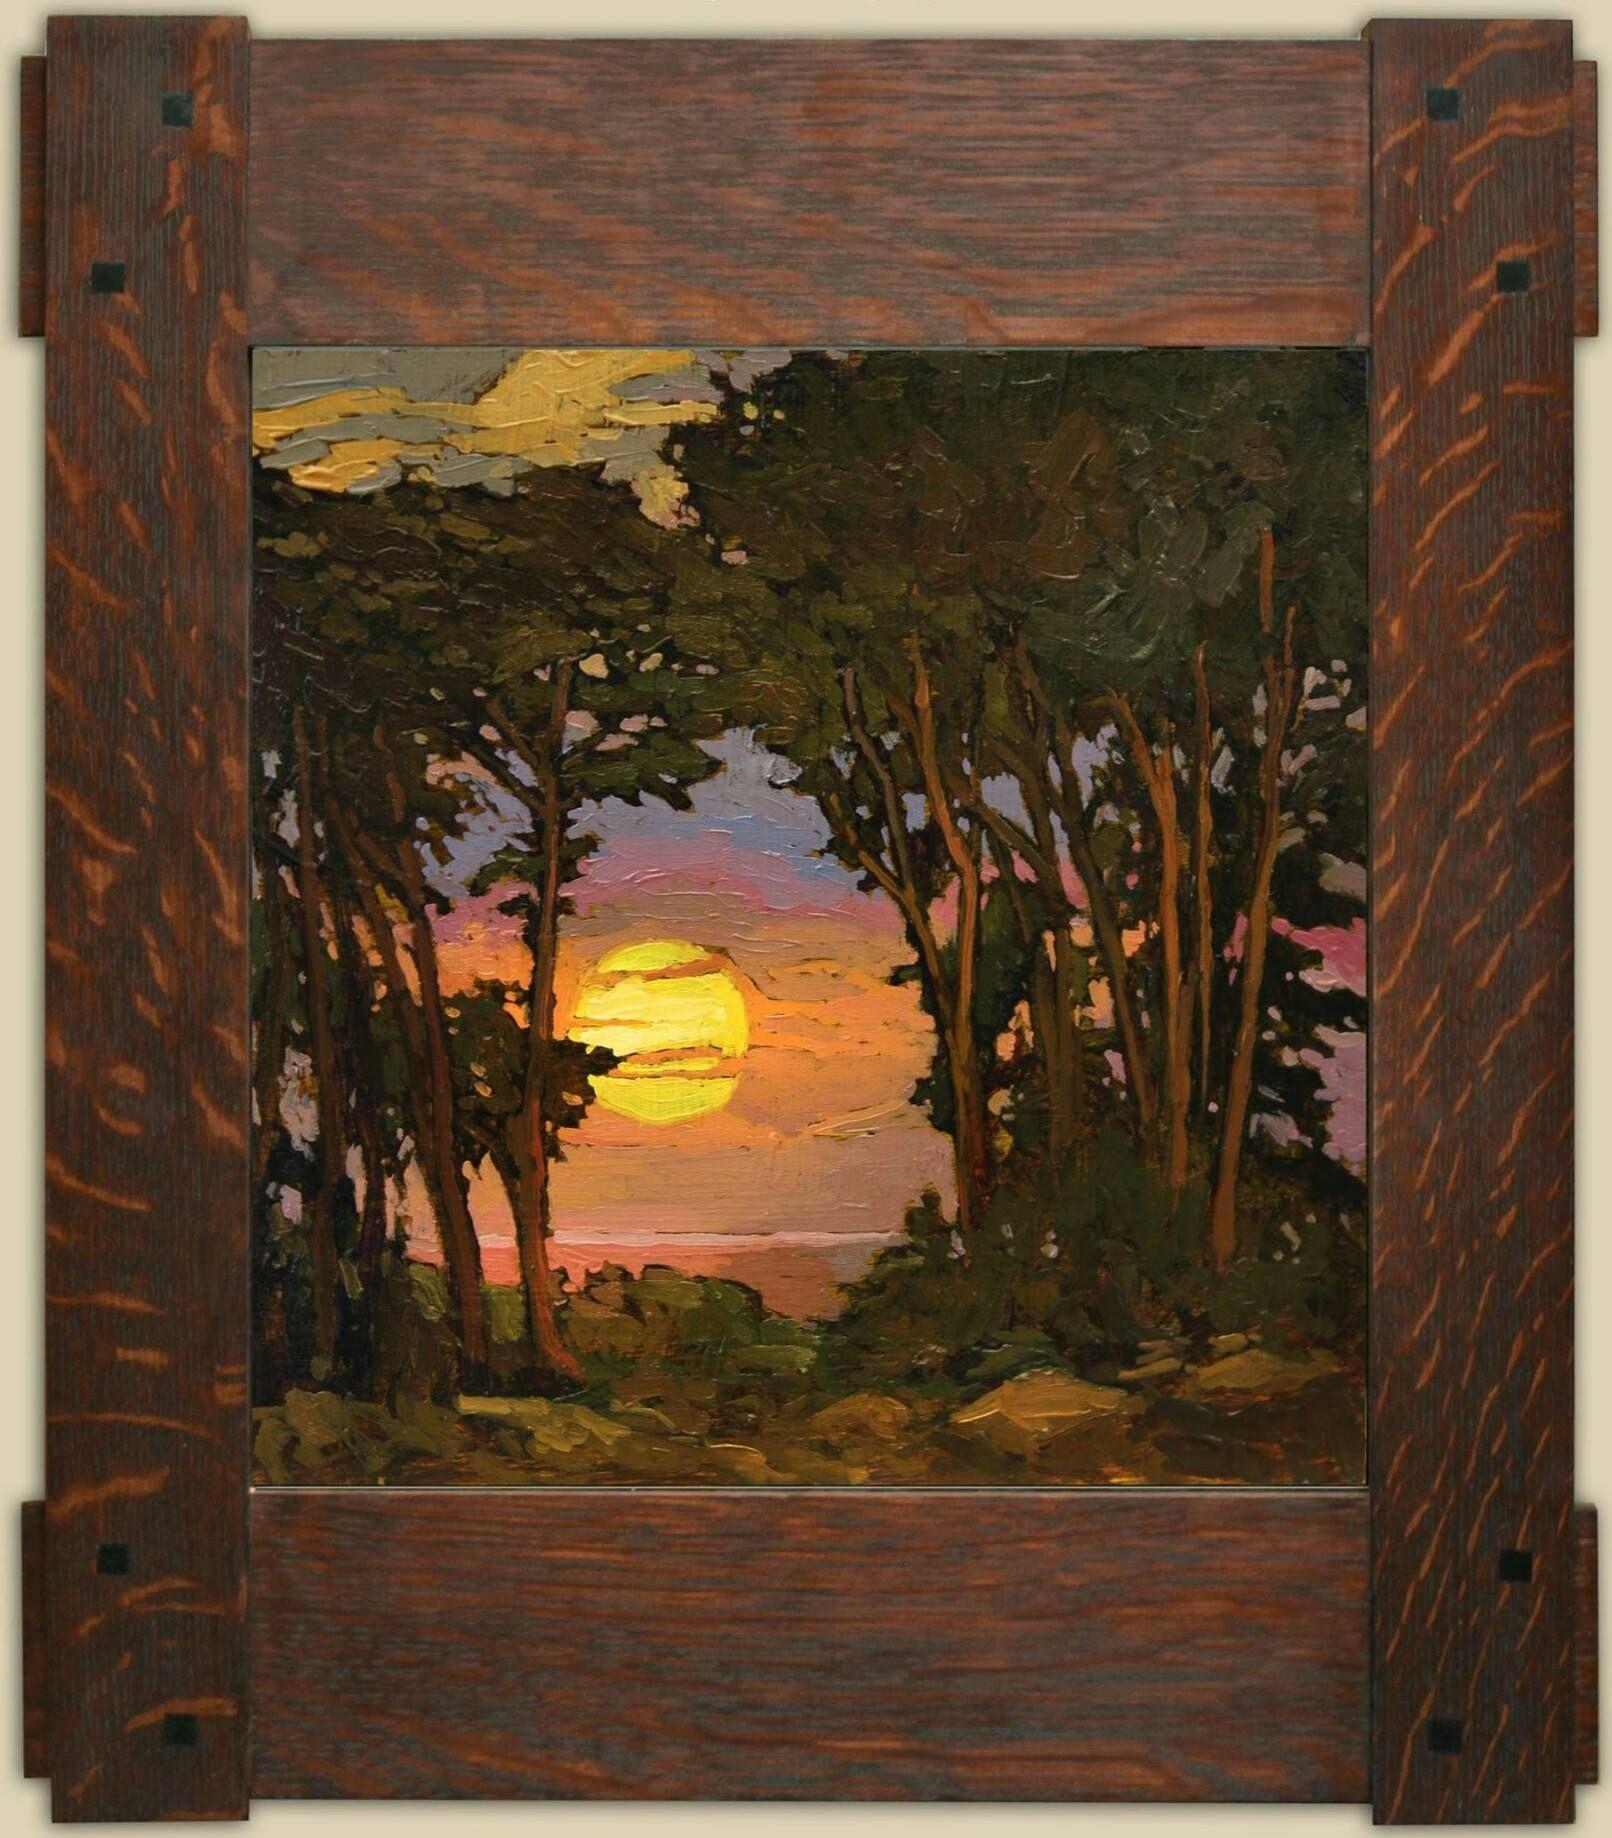 """Sunset on the Coast""   Jan Schmuckal   Dard Hunter Studios Frame   Arts and Crafts   Bungalow   Impressionism"